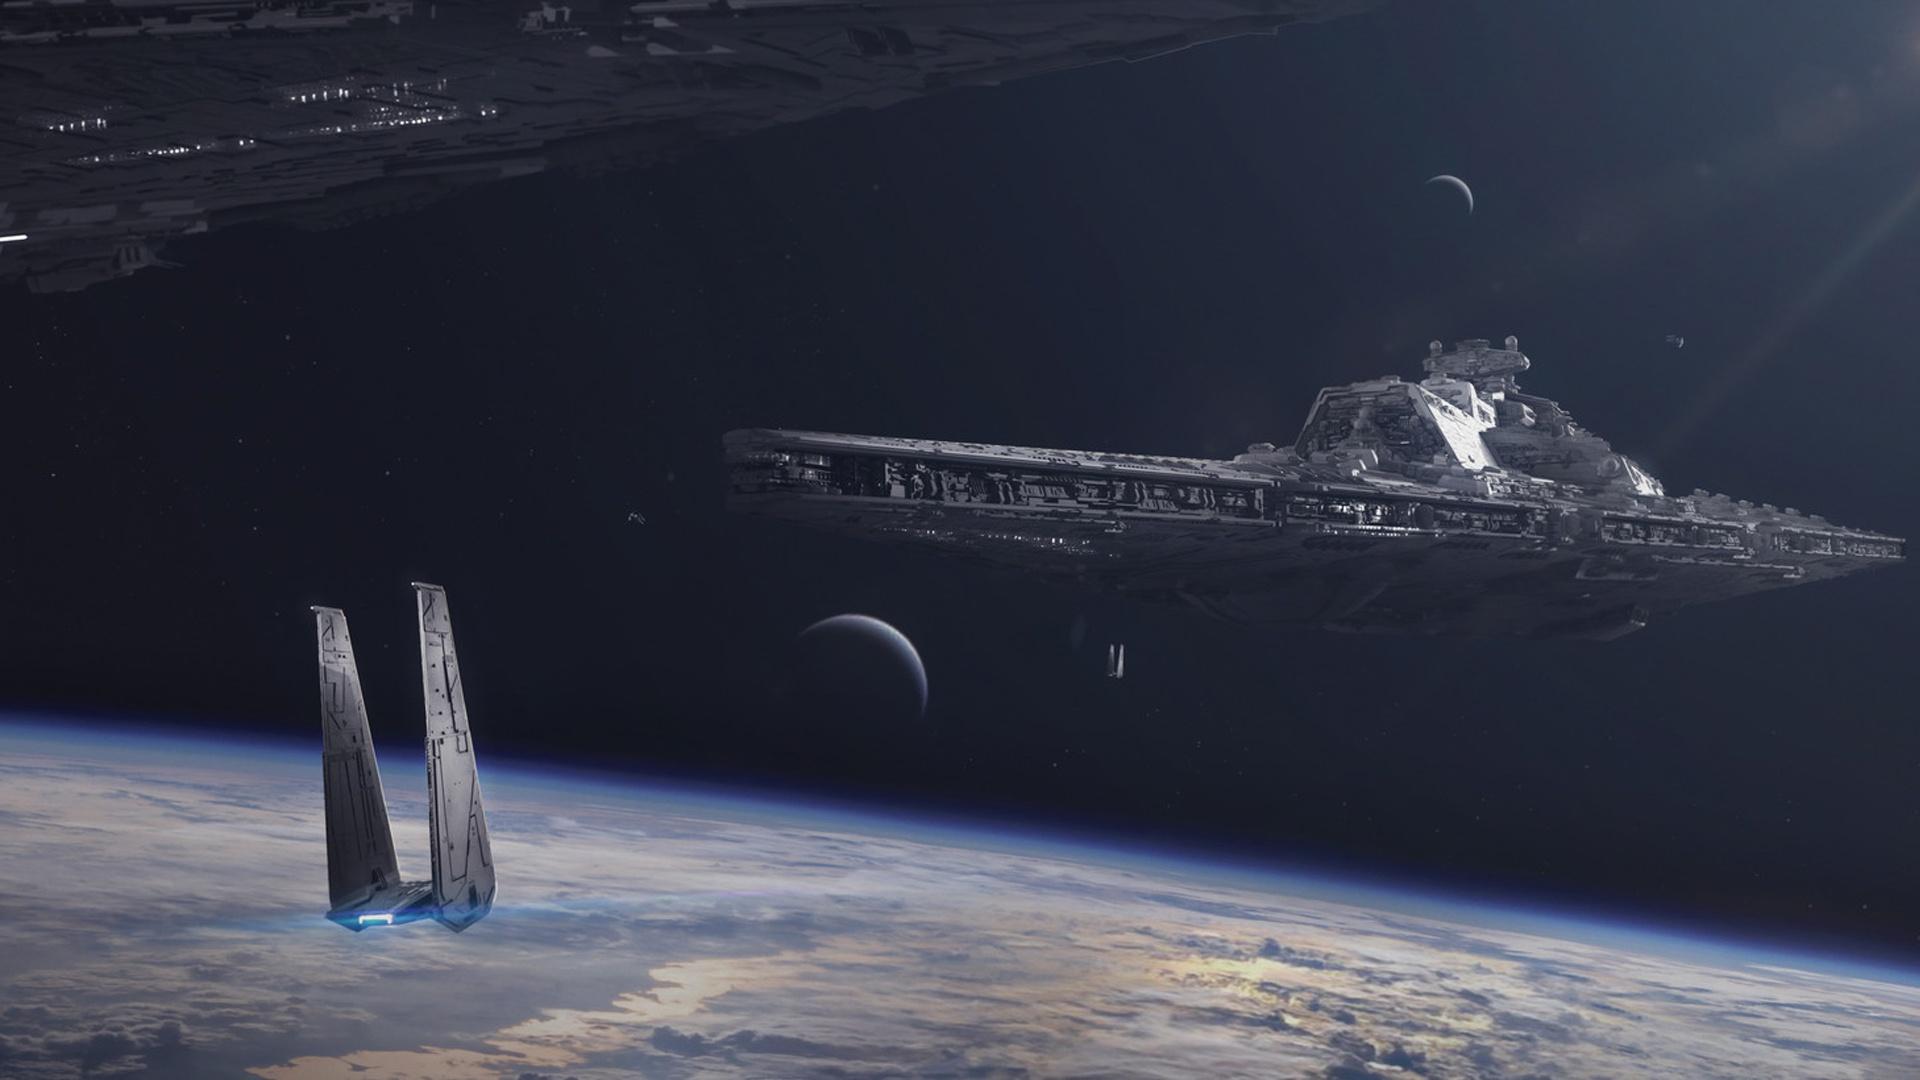 Star Wars Hd Wallpaper Background Image 1920x1080 Id